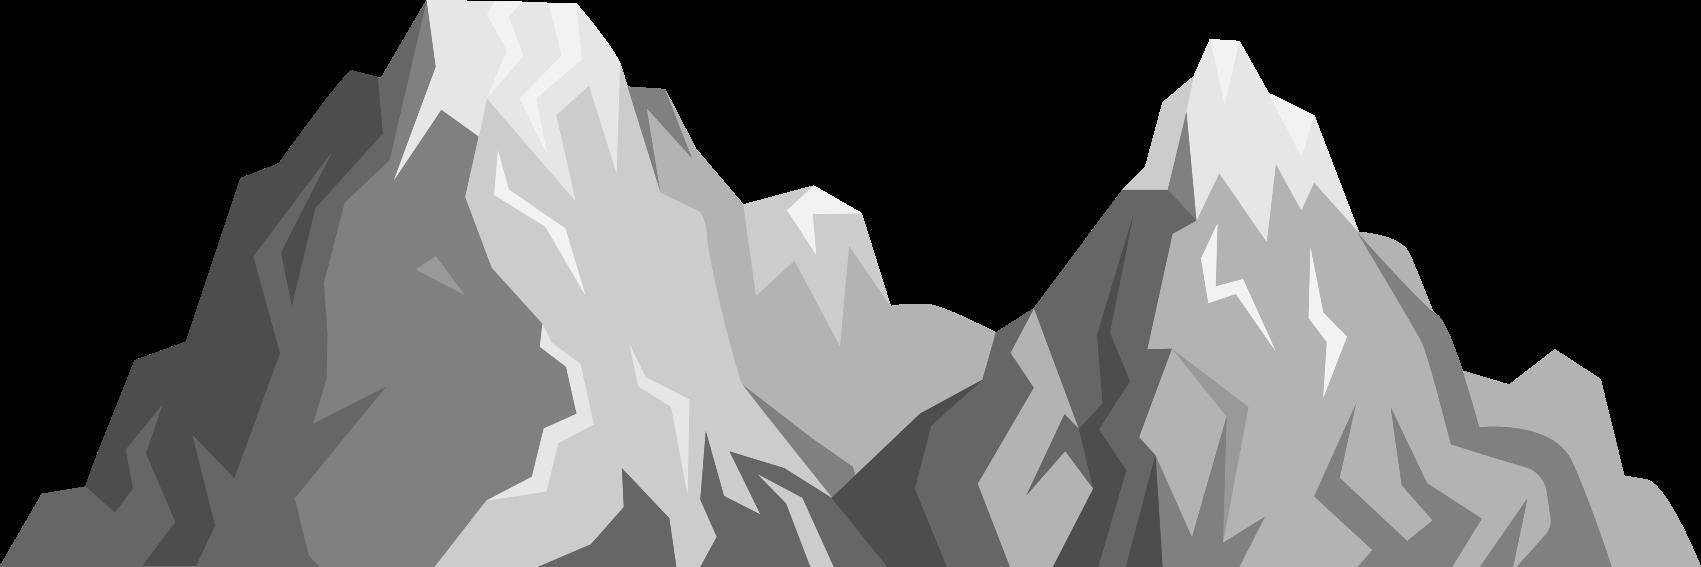 TENSTICKERS. 灰色の山の風景ステッカー. 雪に覆われた山々をイメージした美しいウォールステッカー。割引あり。